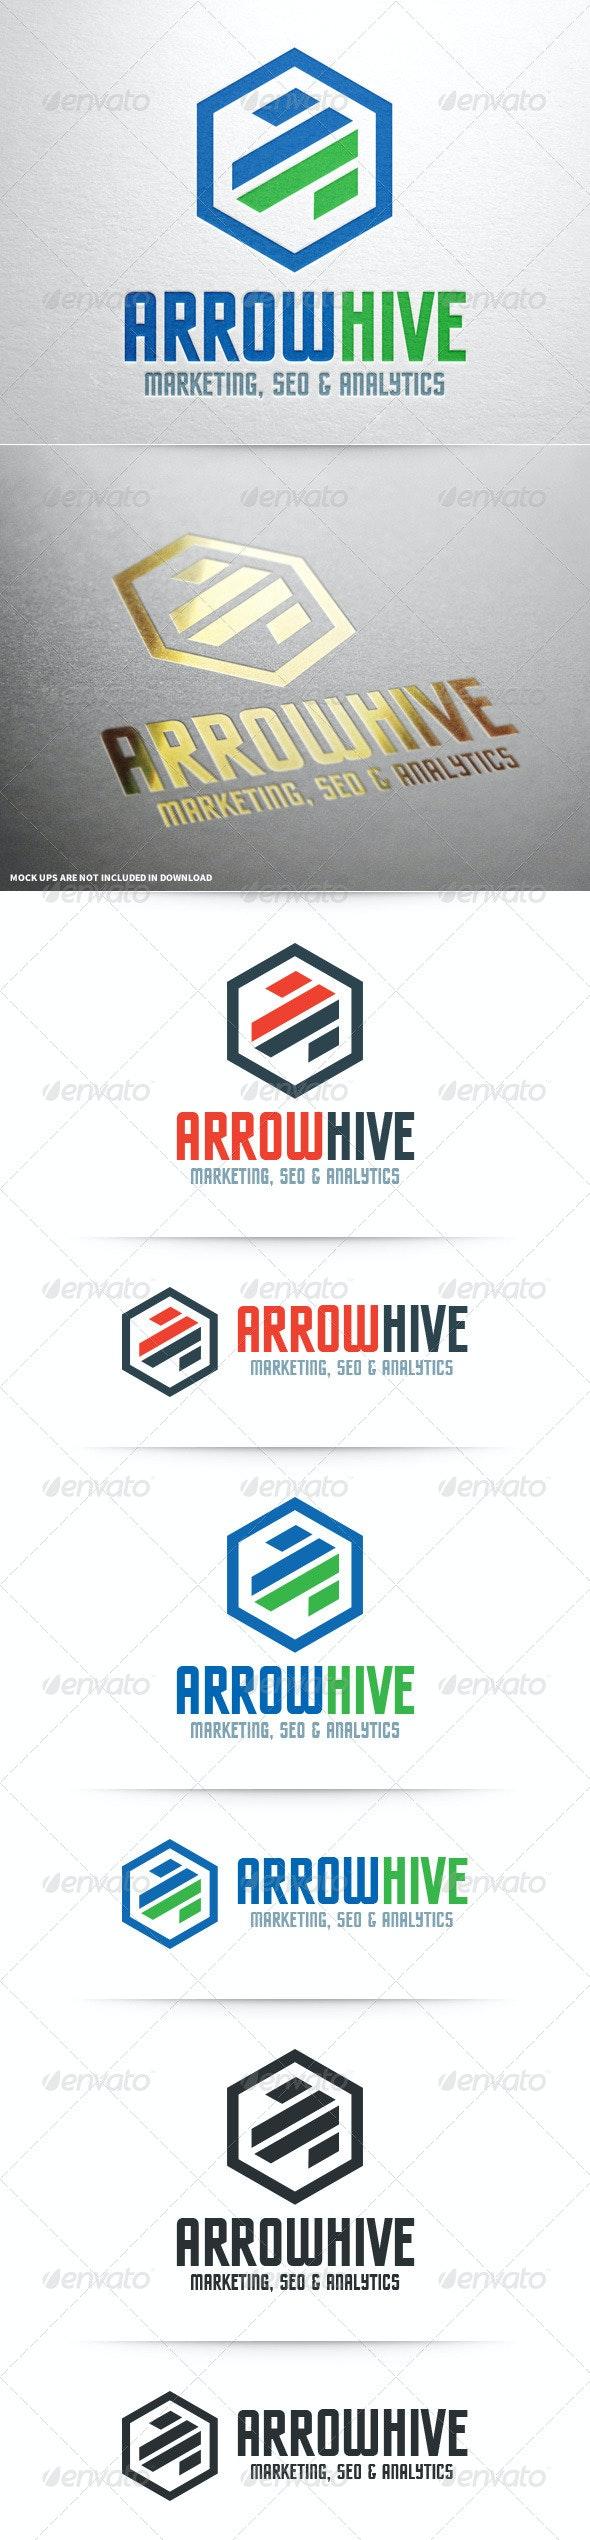 Arrow Hive Logo Template